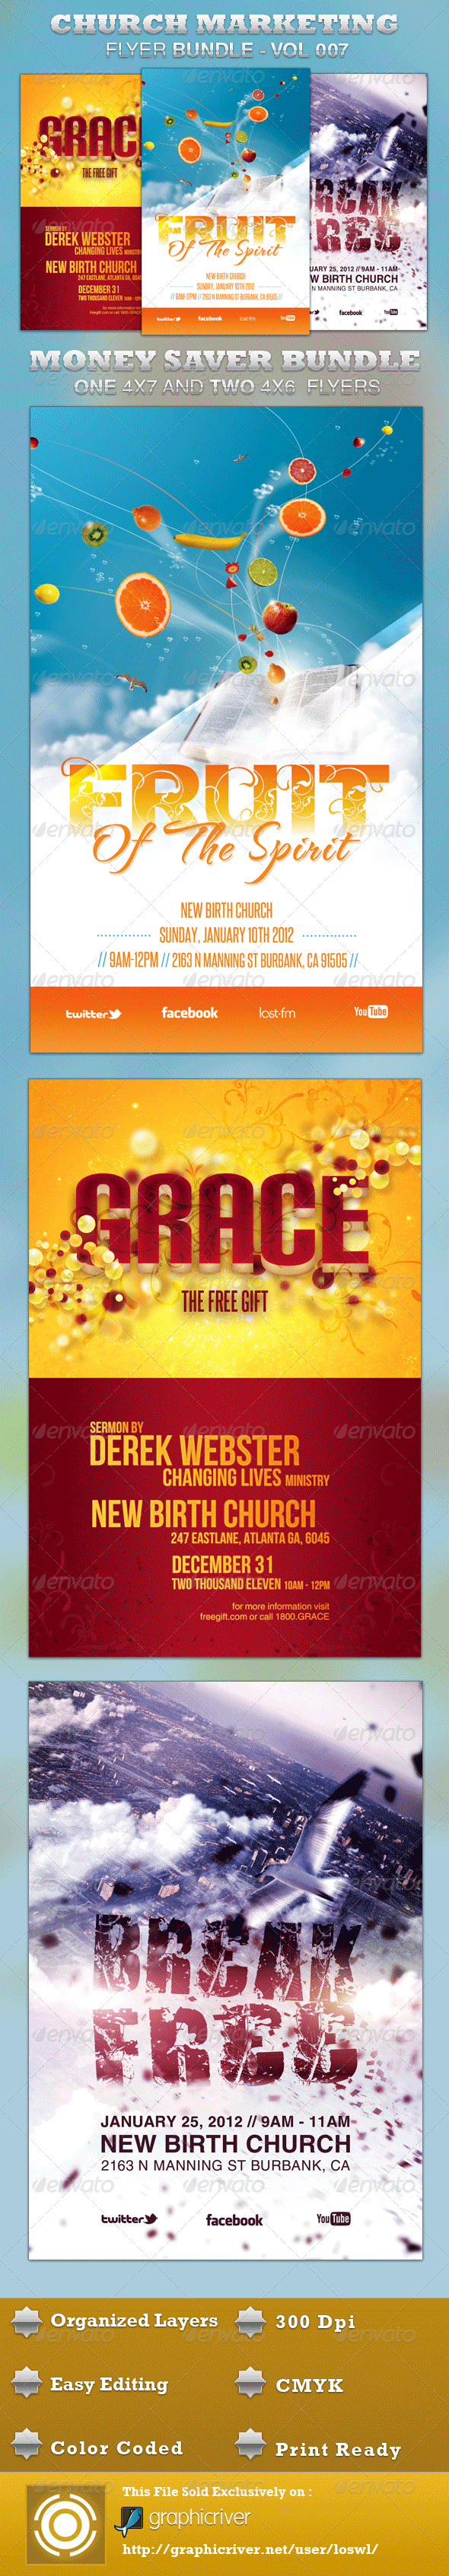 GraphicRiver Church Marketing Flyer Bundle-Vol 007 3439482